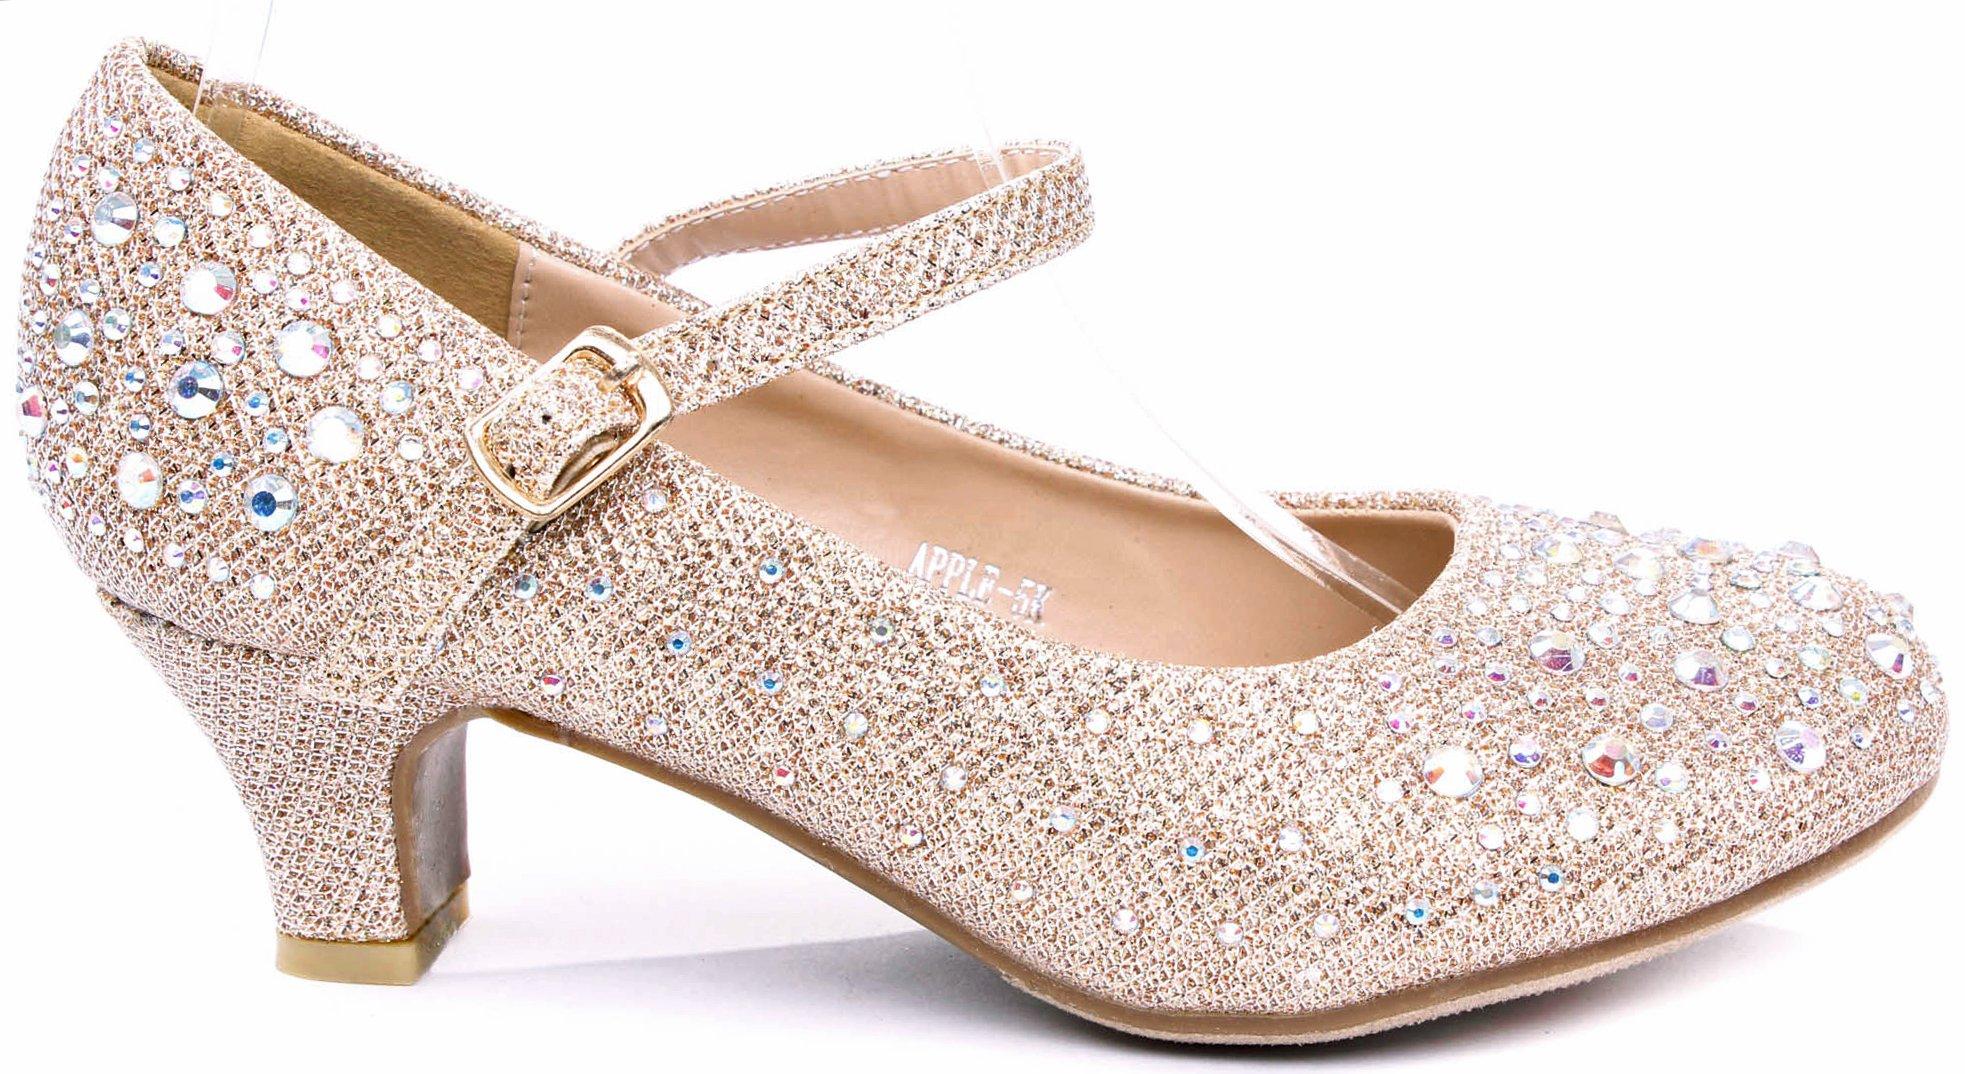 JJF Shoes Apple Kids Champagne Sparkling Mary Jane Rhinestone Glitter Formal Dress Low Heel Pumps-4